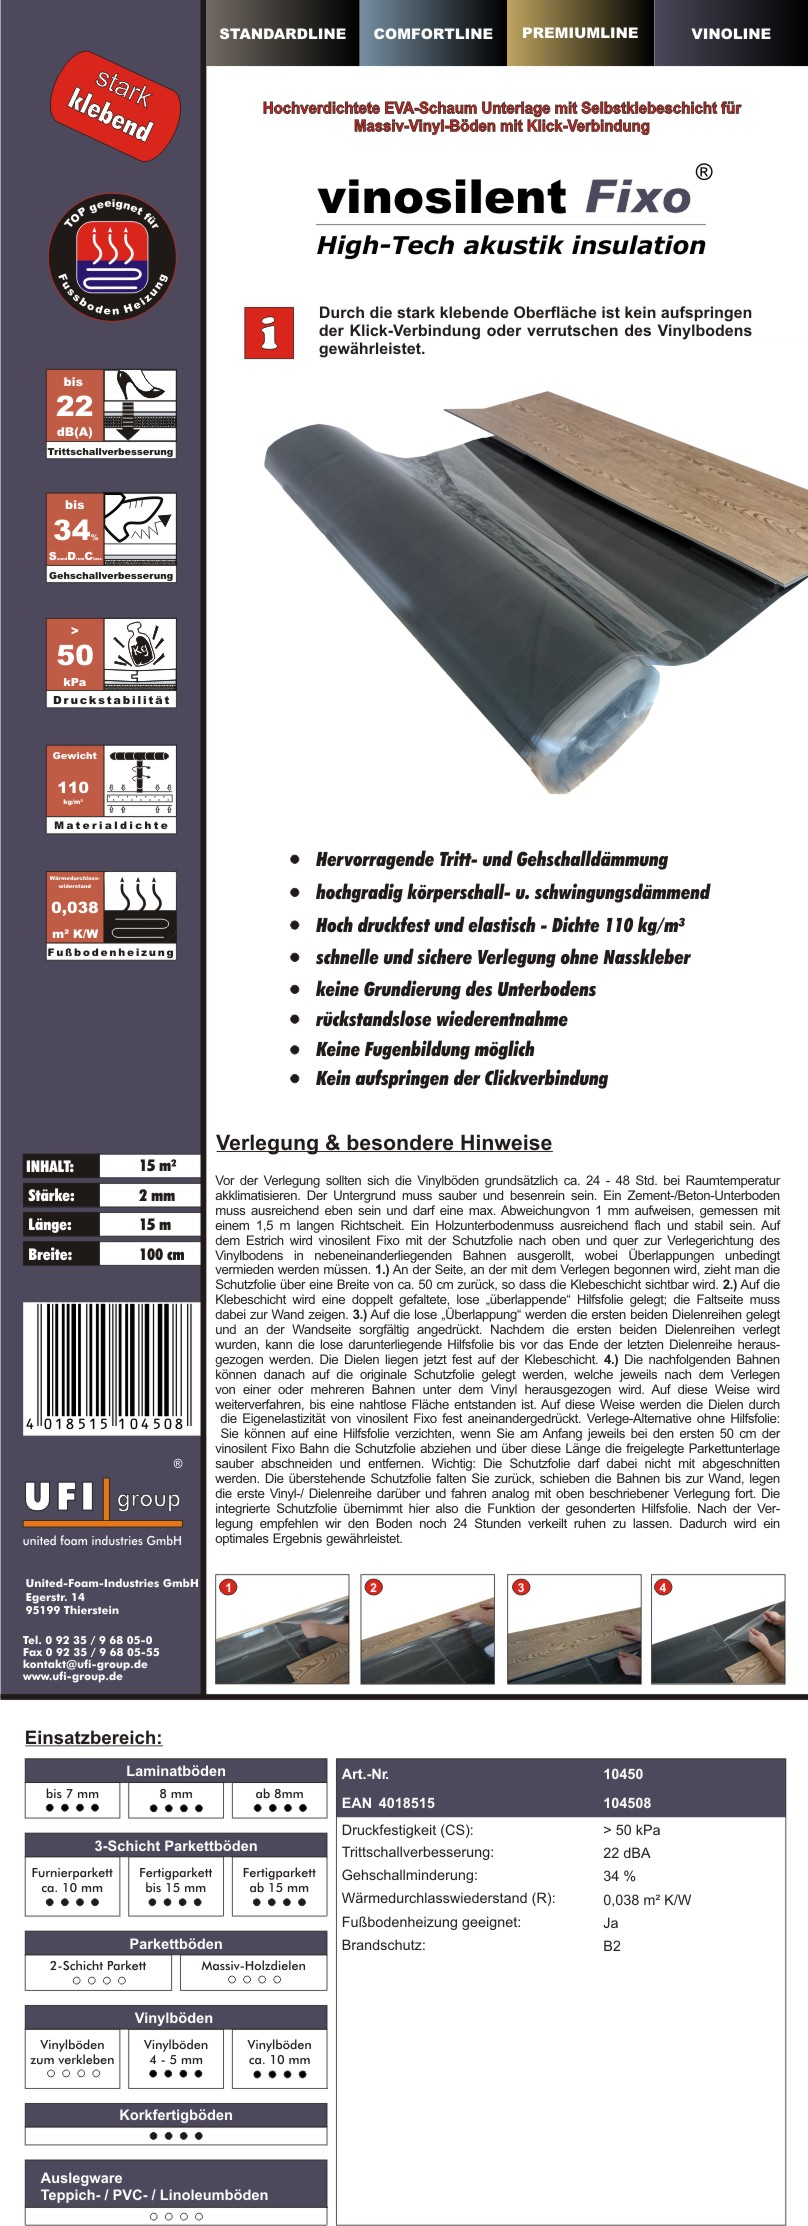 vinosilentfixo-2mm-Einleger